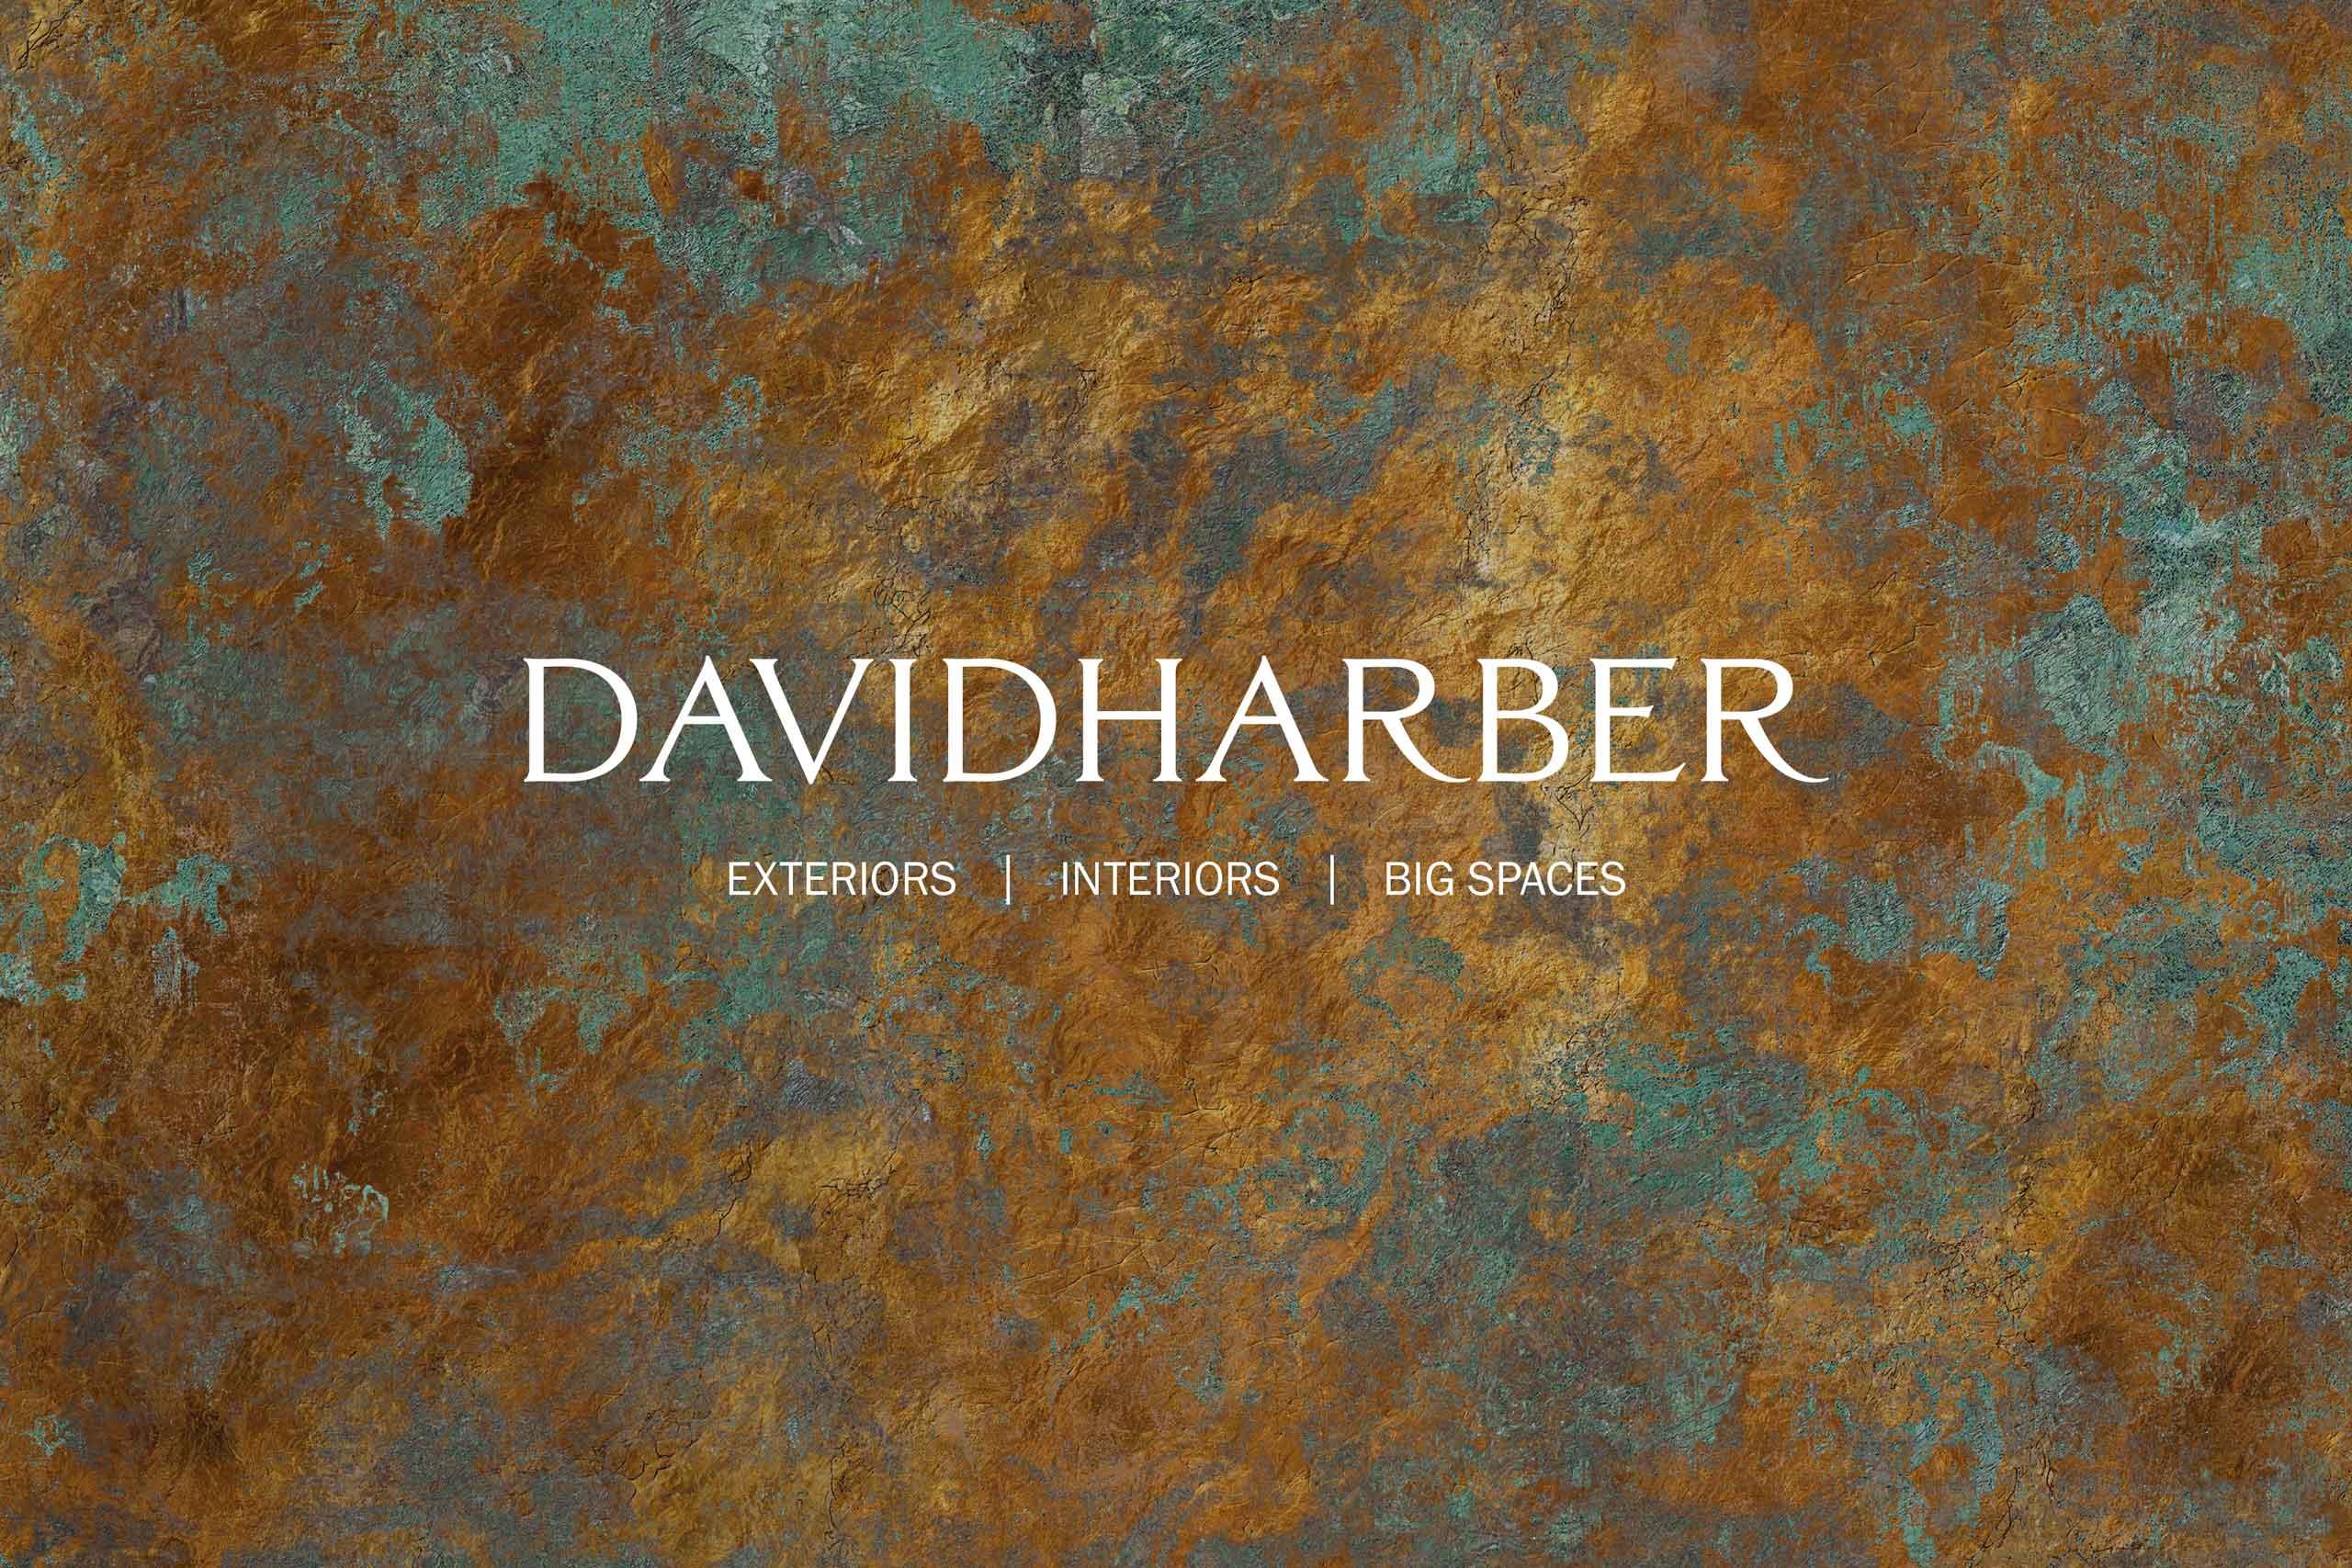 David Harber Identity